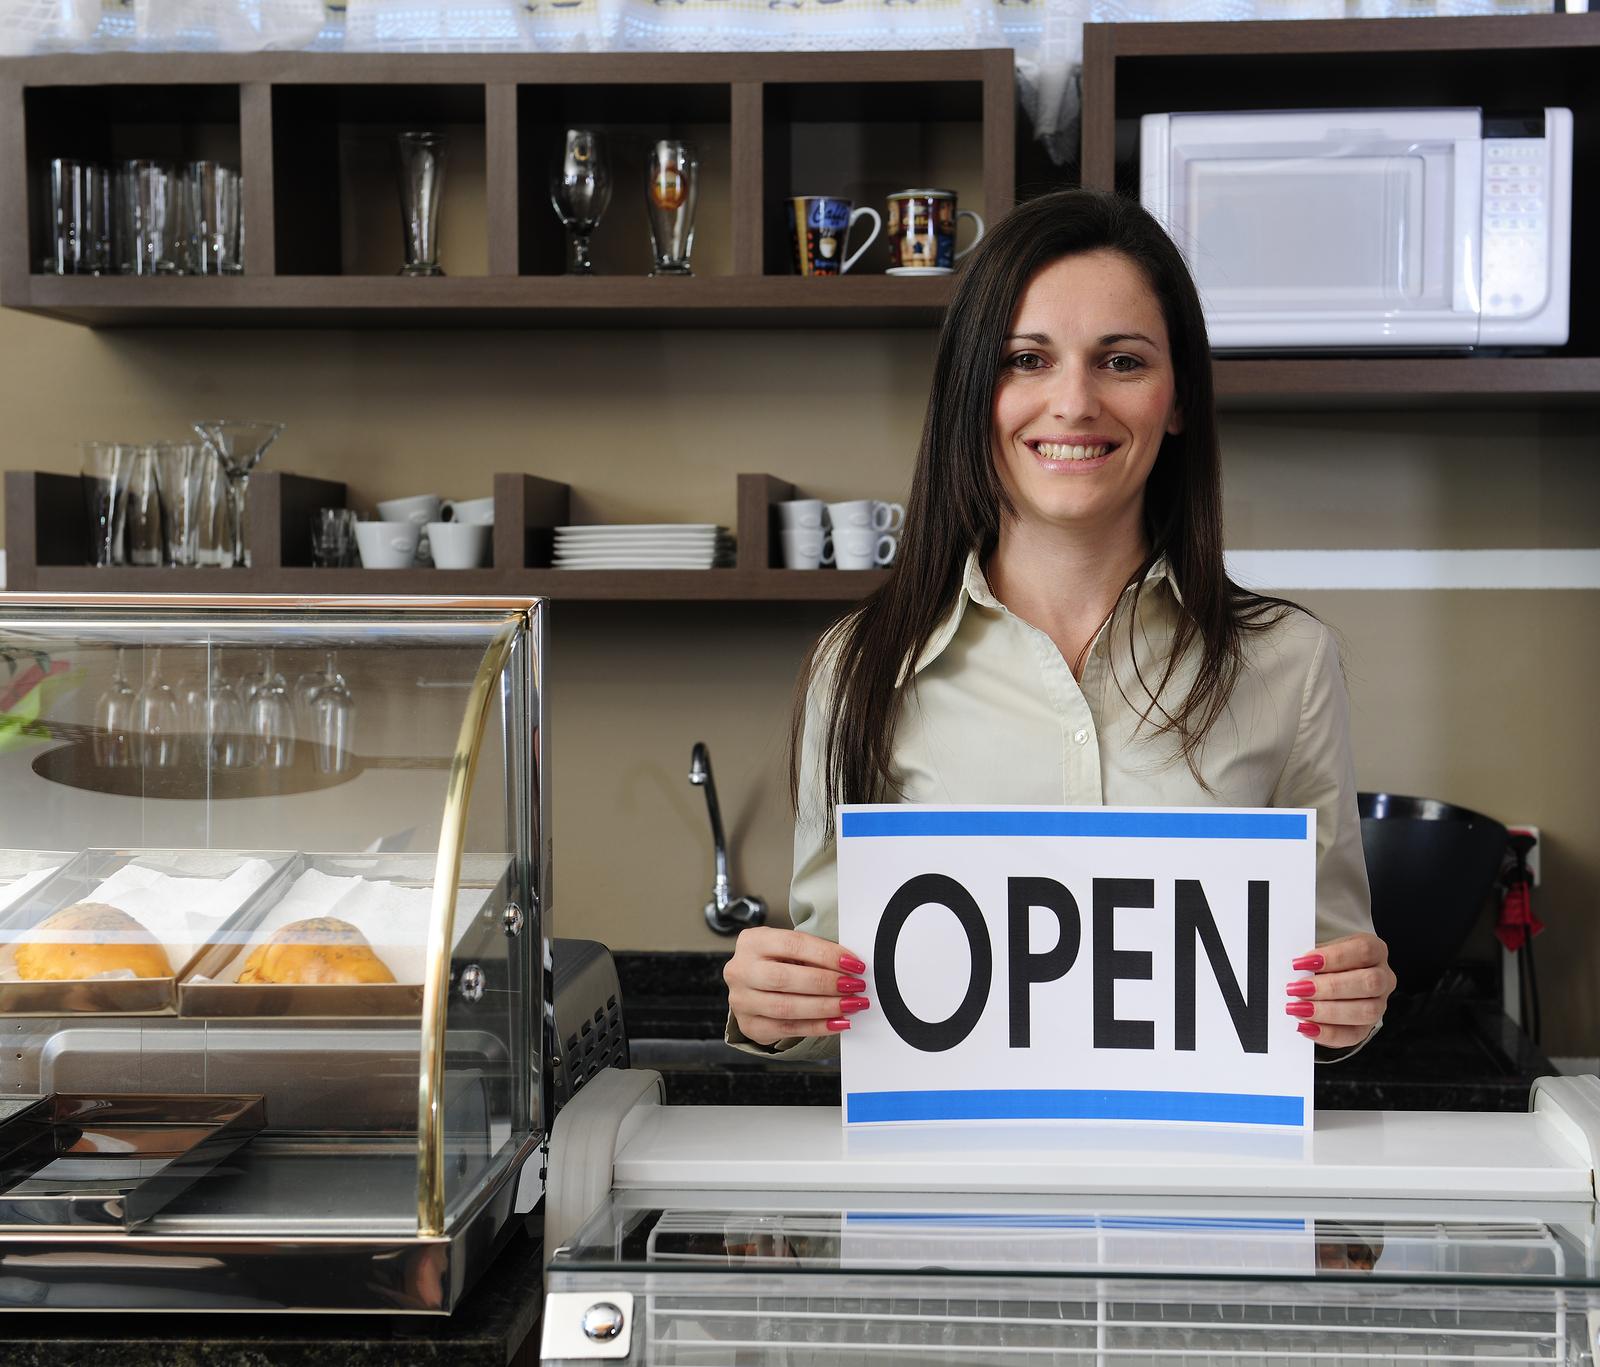 5 Ways of Advertising Your UK Online Business Offline {Infographic}